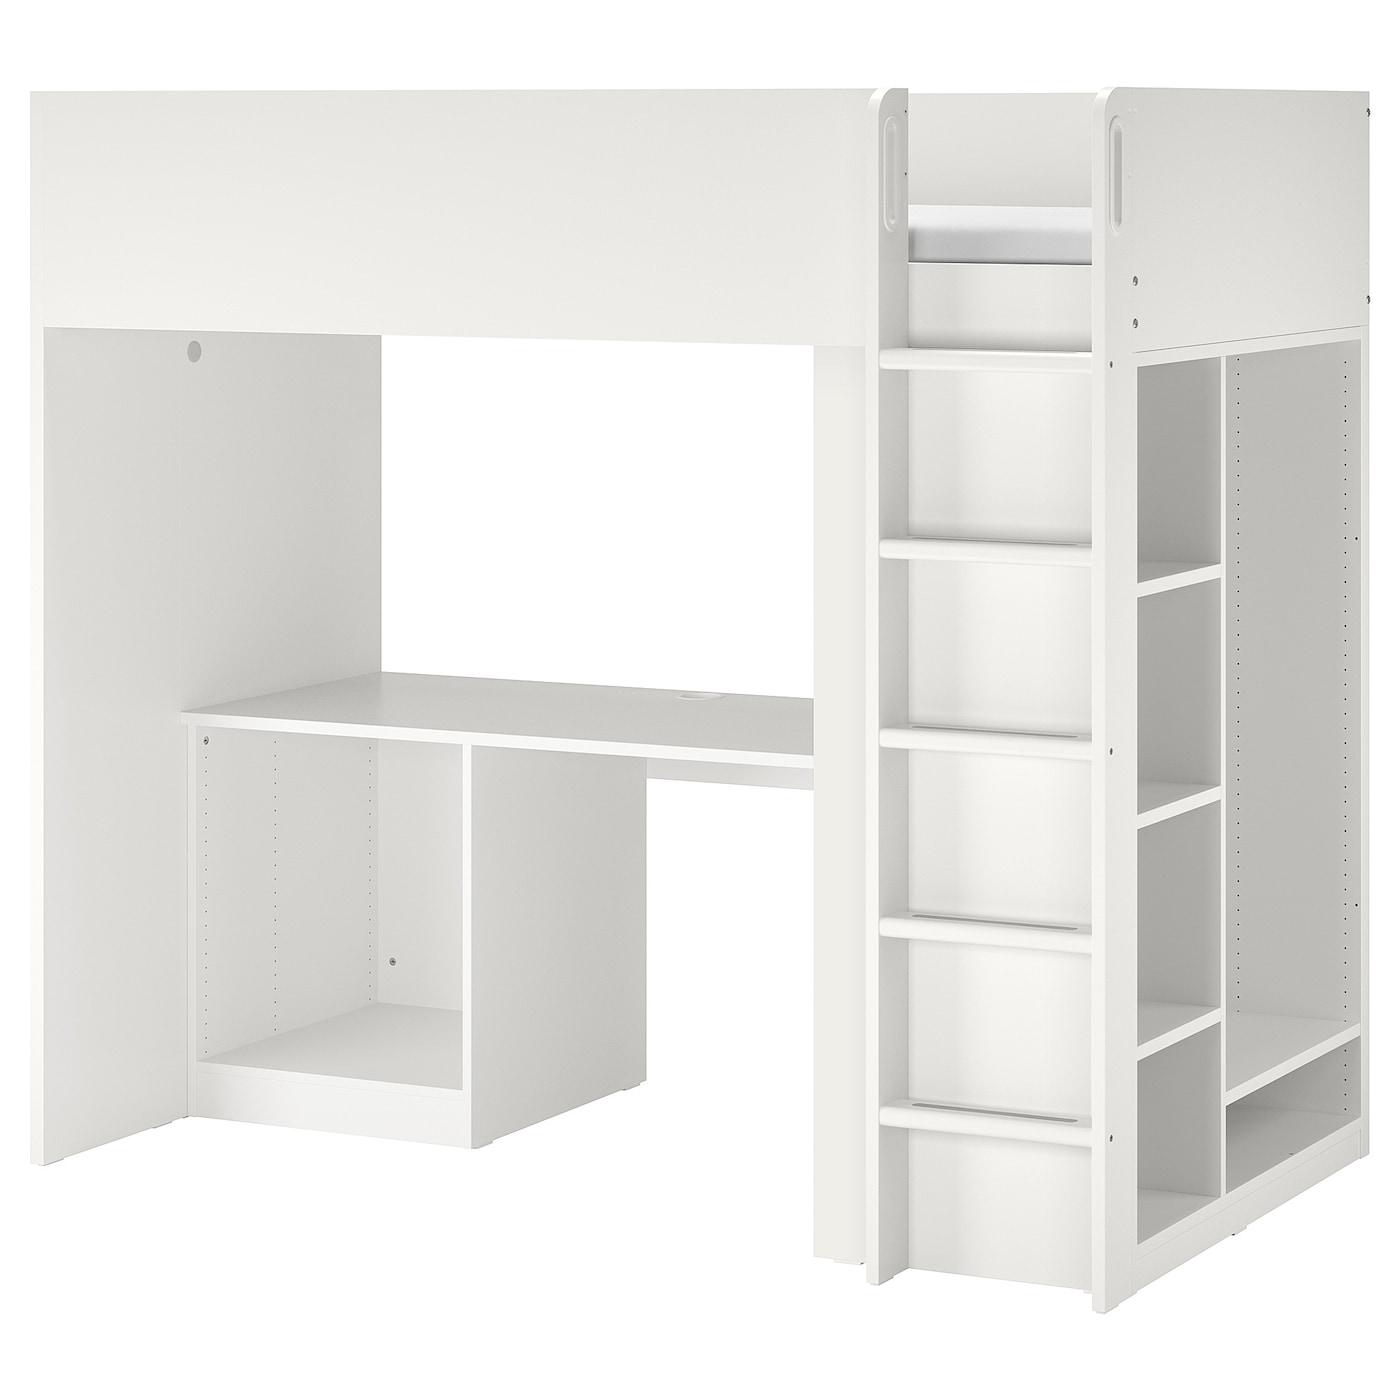 Smastad Loft Bed Frame W Desk And Storage White 90x200 Cm Ikea Ireland